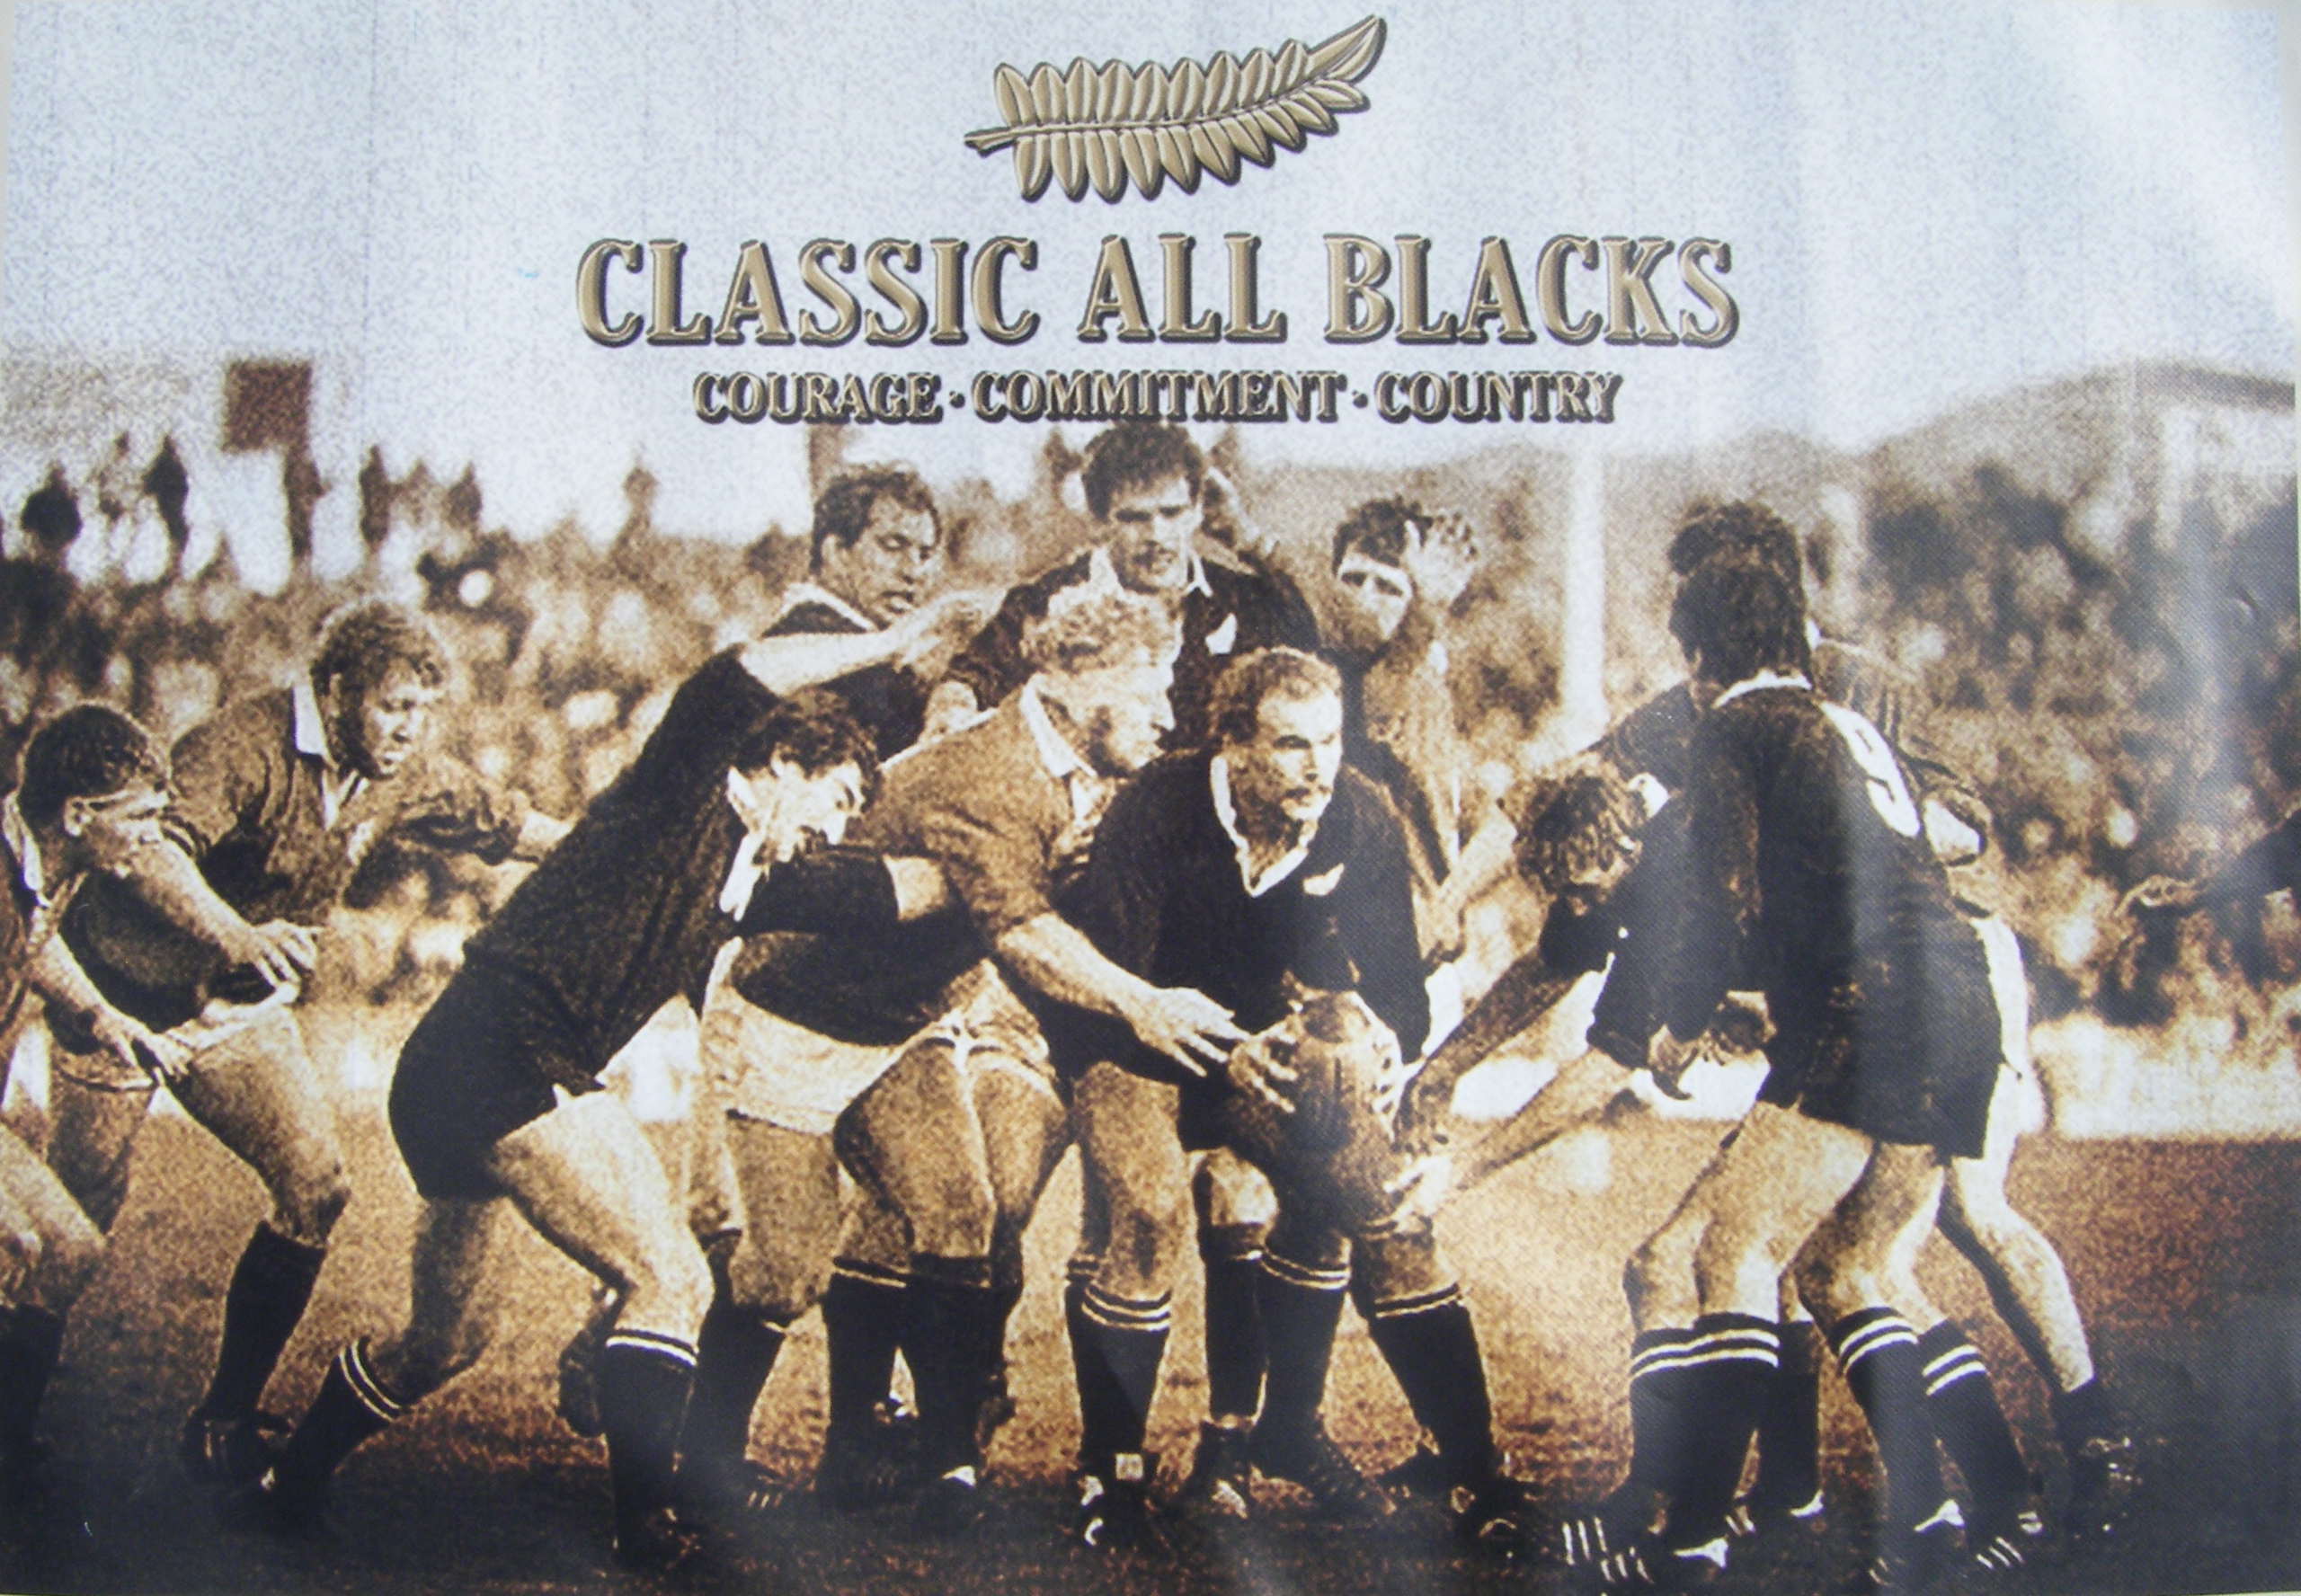 CLASSIC ALL BLACK 1